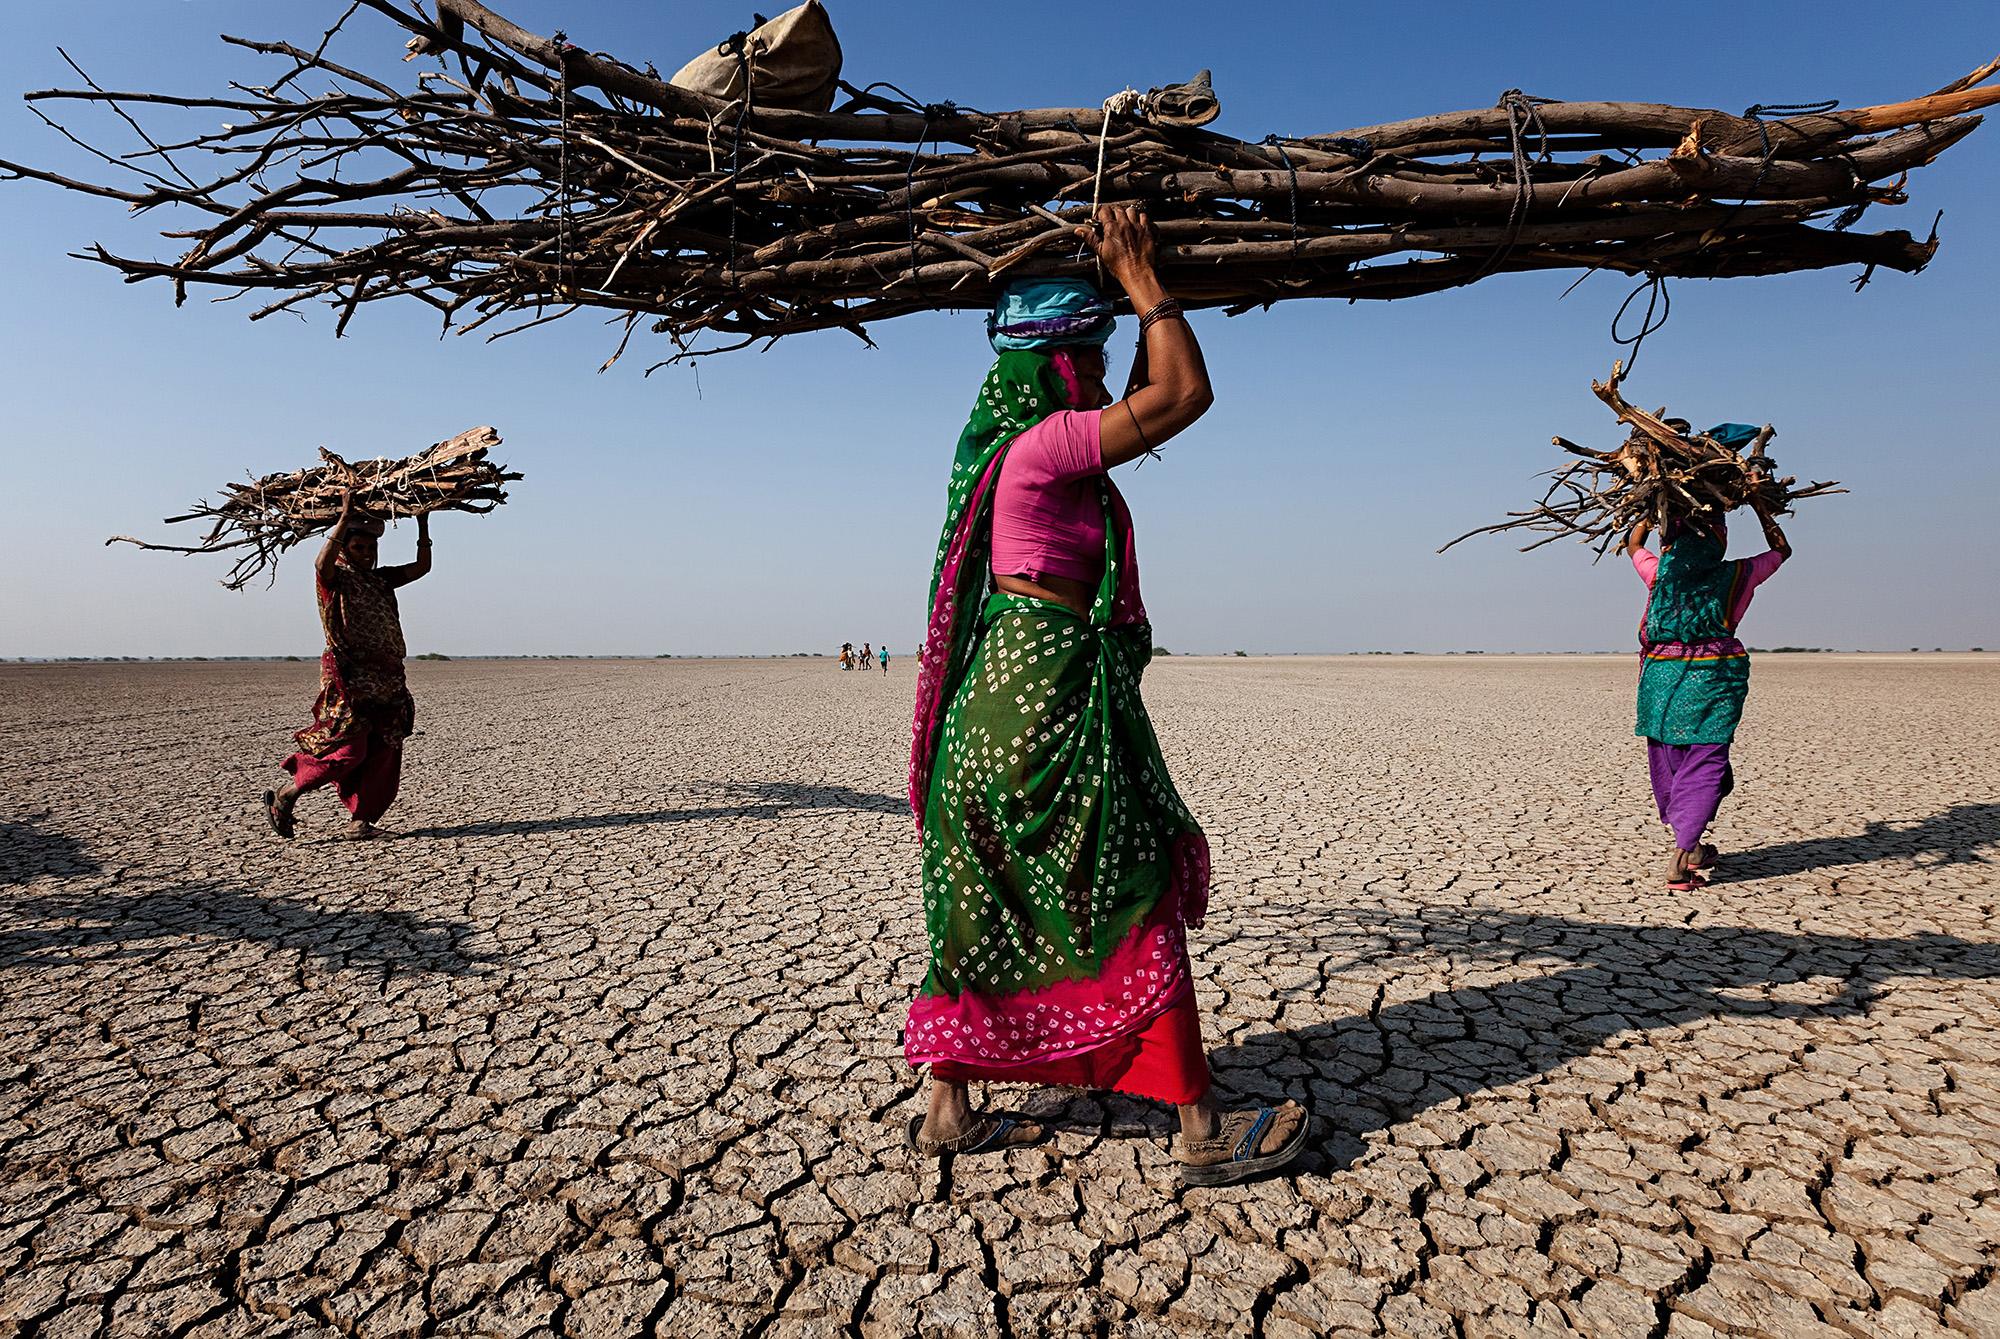 Fotografia documentaria a colori di Johan Gerrits di donne che trasportano legna da ardere in India